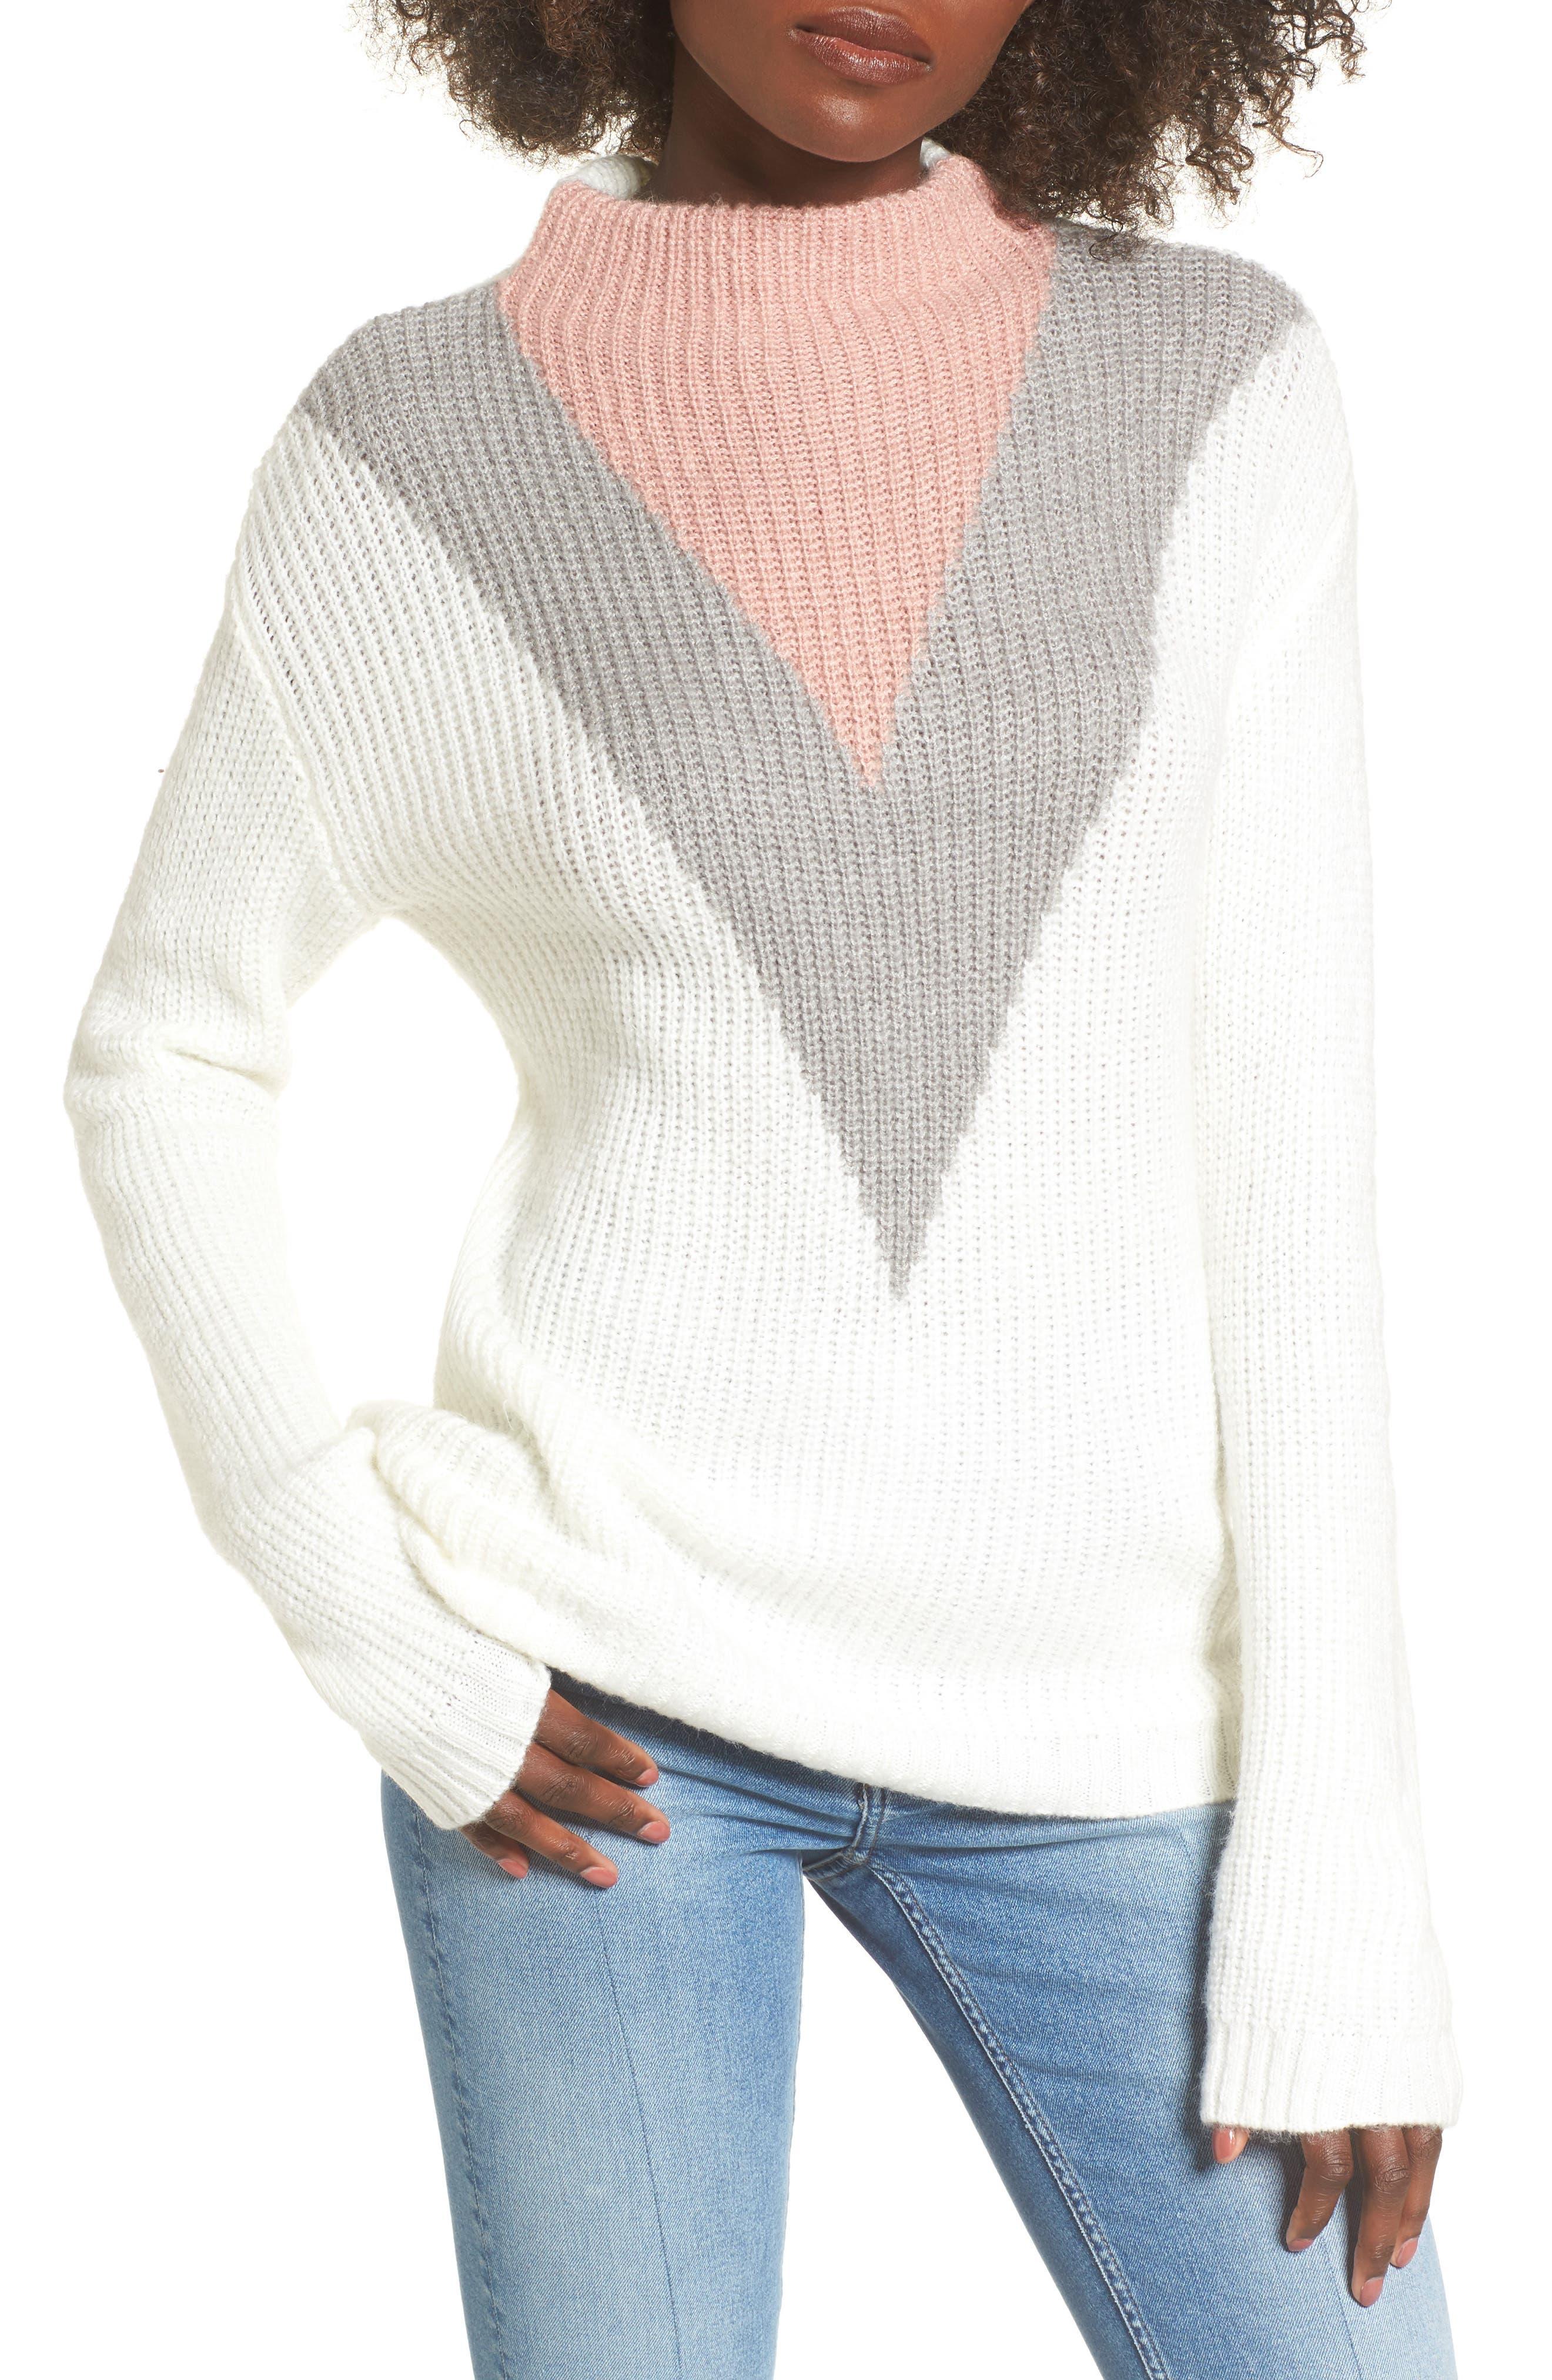 Alternate Image 1 Selected - Cotton Emporium Tri-Color Après Ski Sweater